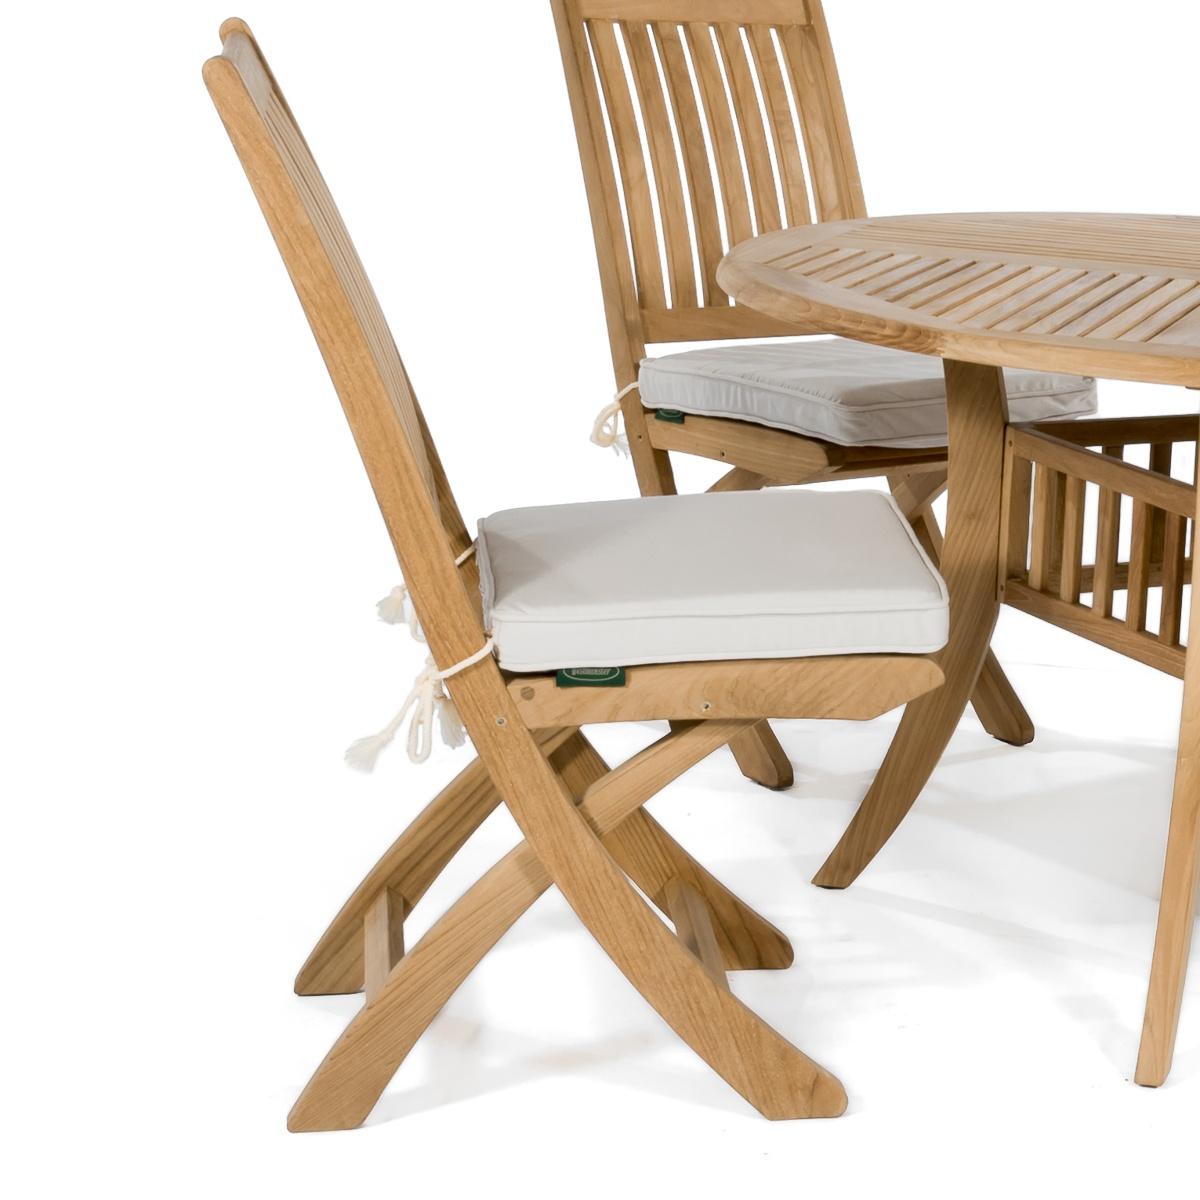 Sunbrella Dining Chair Cushion Westminster Teak Outdoor